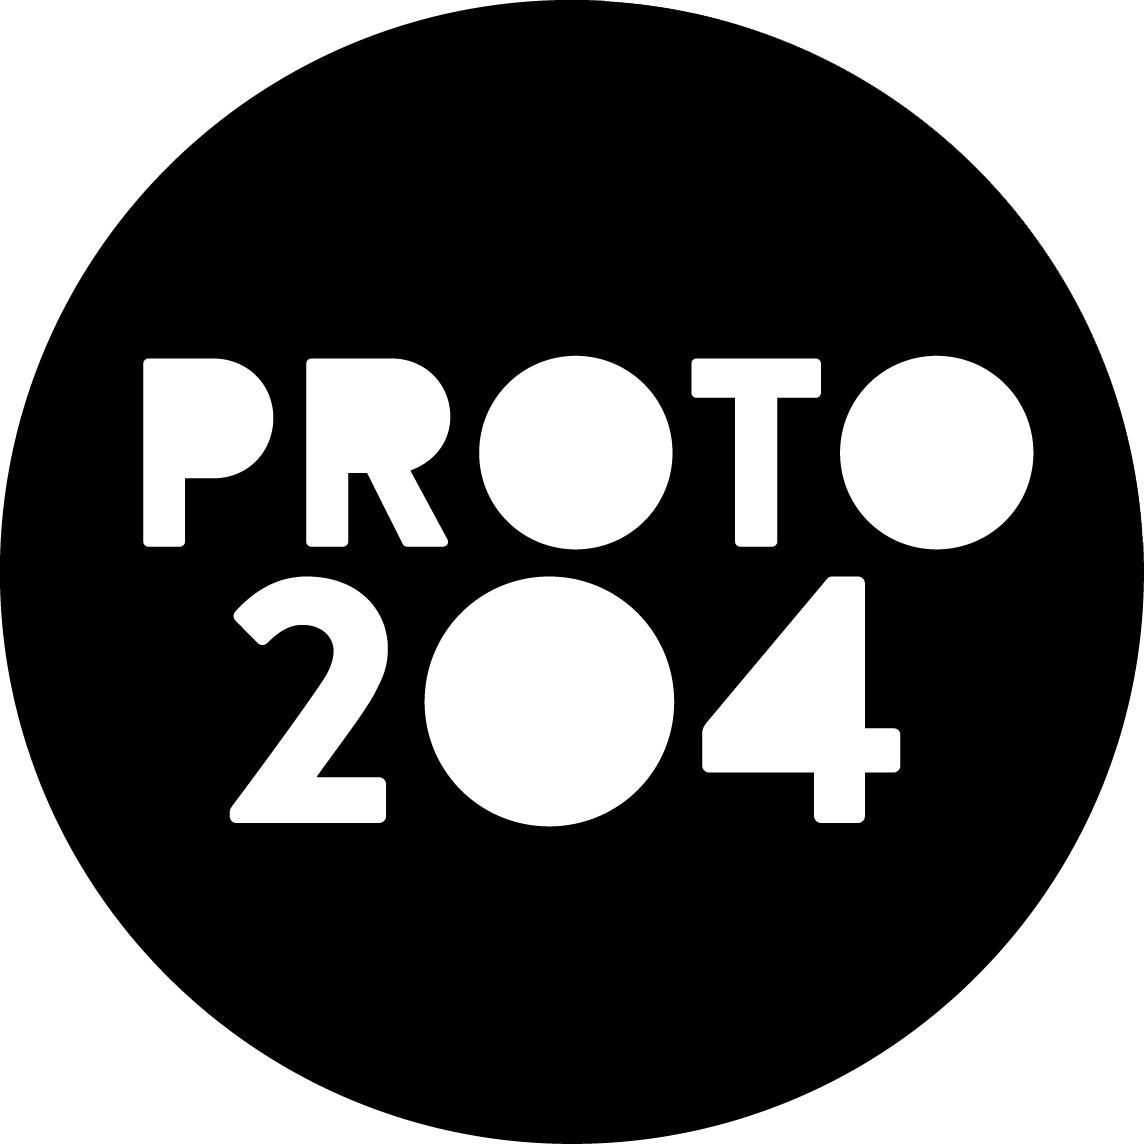 PROTO204